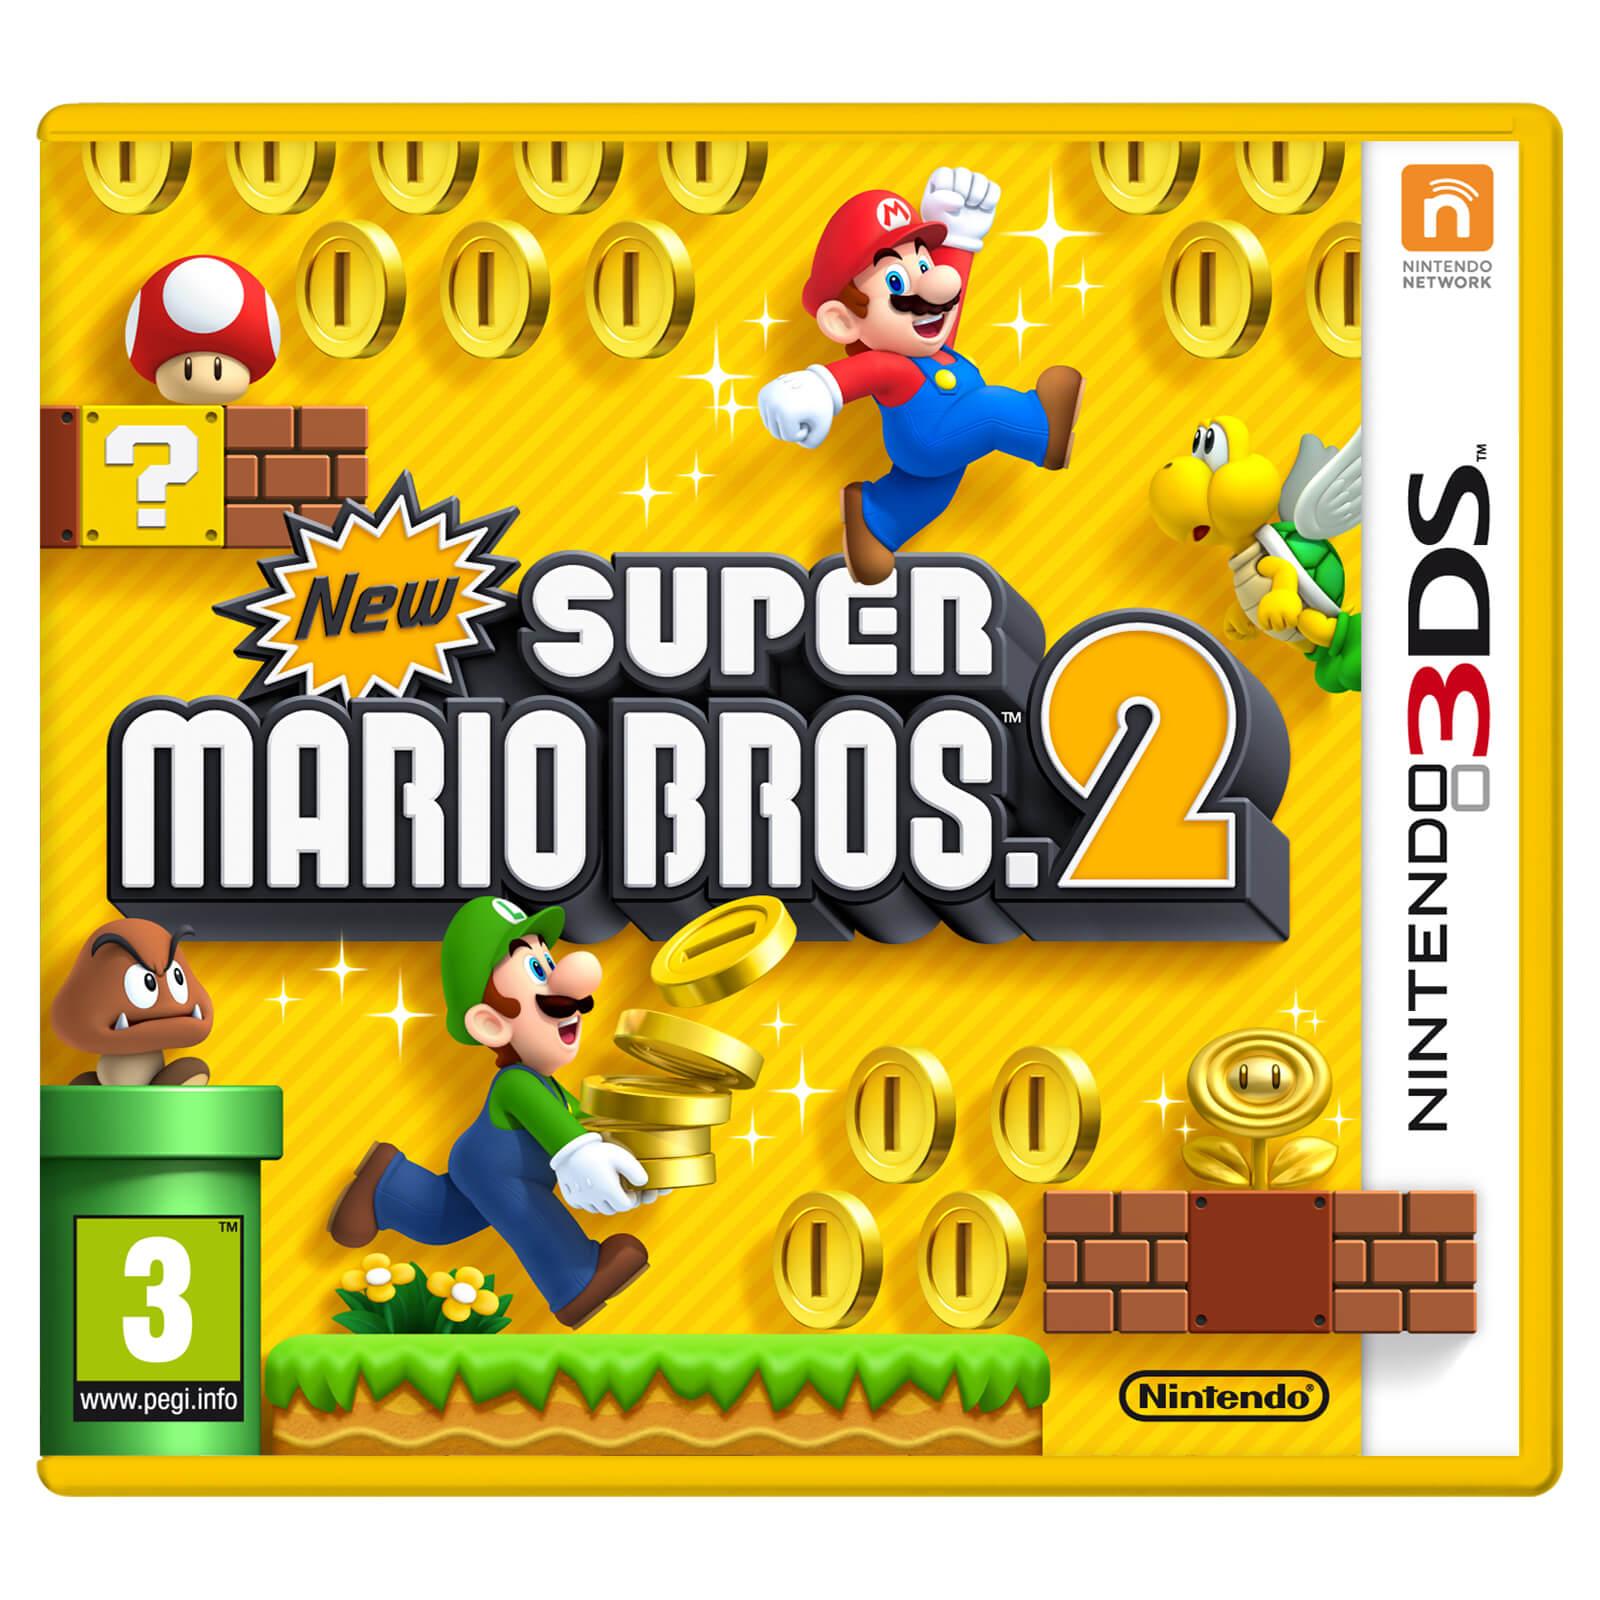 New super mario bros 2 save game run a casino night